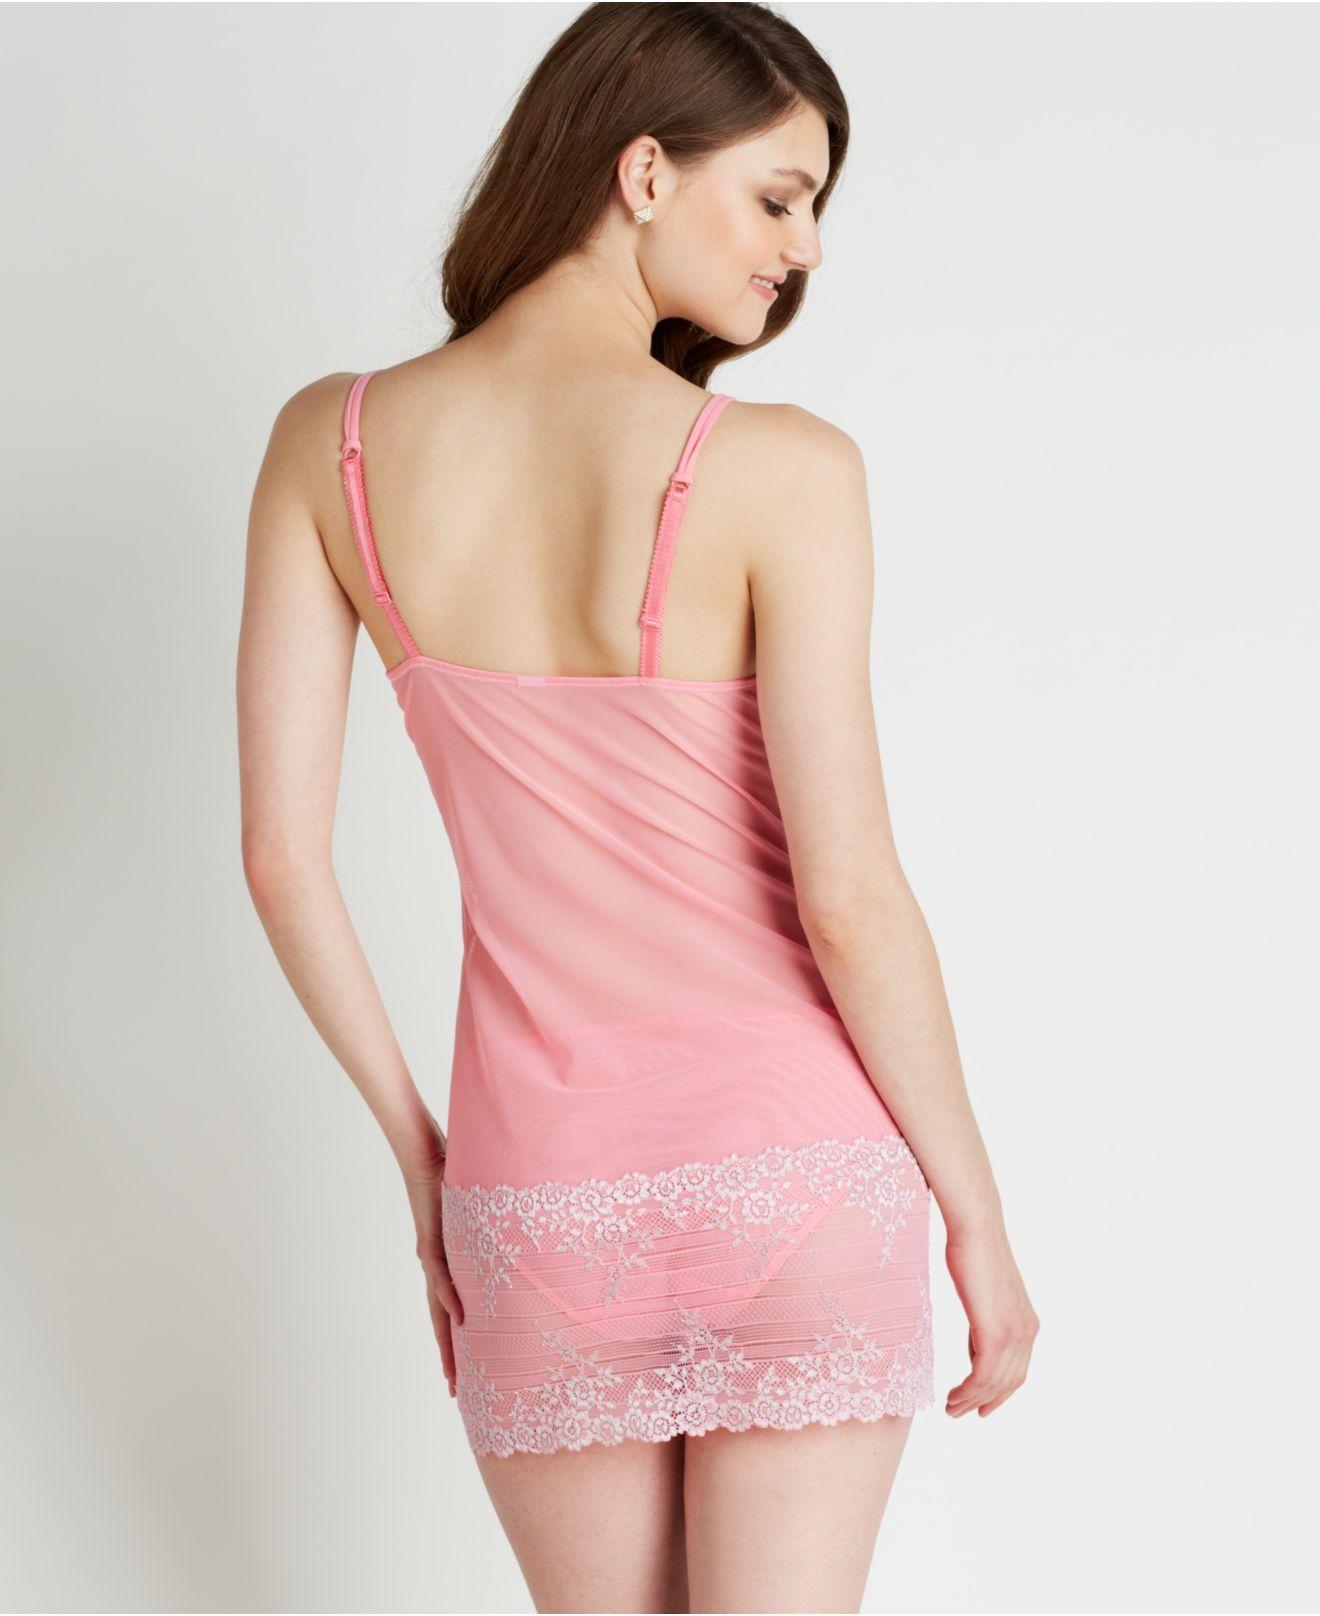 72ebd1835953a Lyst wacoal embrace lace chemise in pink jpg 1320x1616 Wacoal chemise